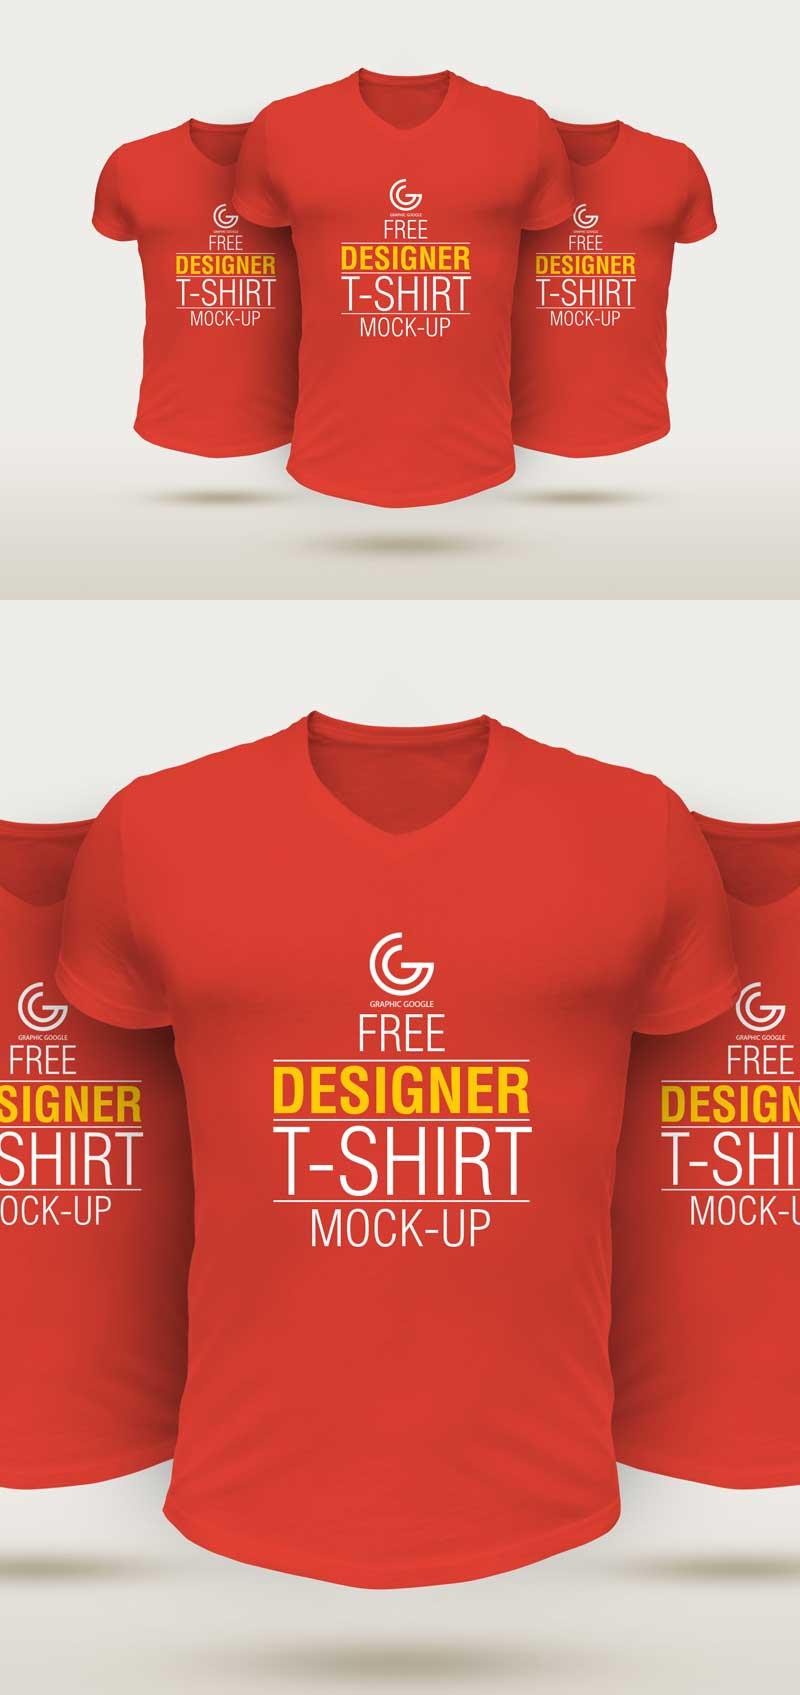 Free-Designer-T-Shirt-Mockup-PSD